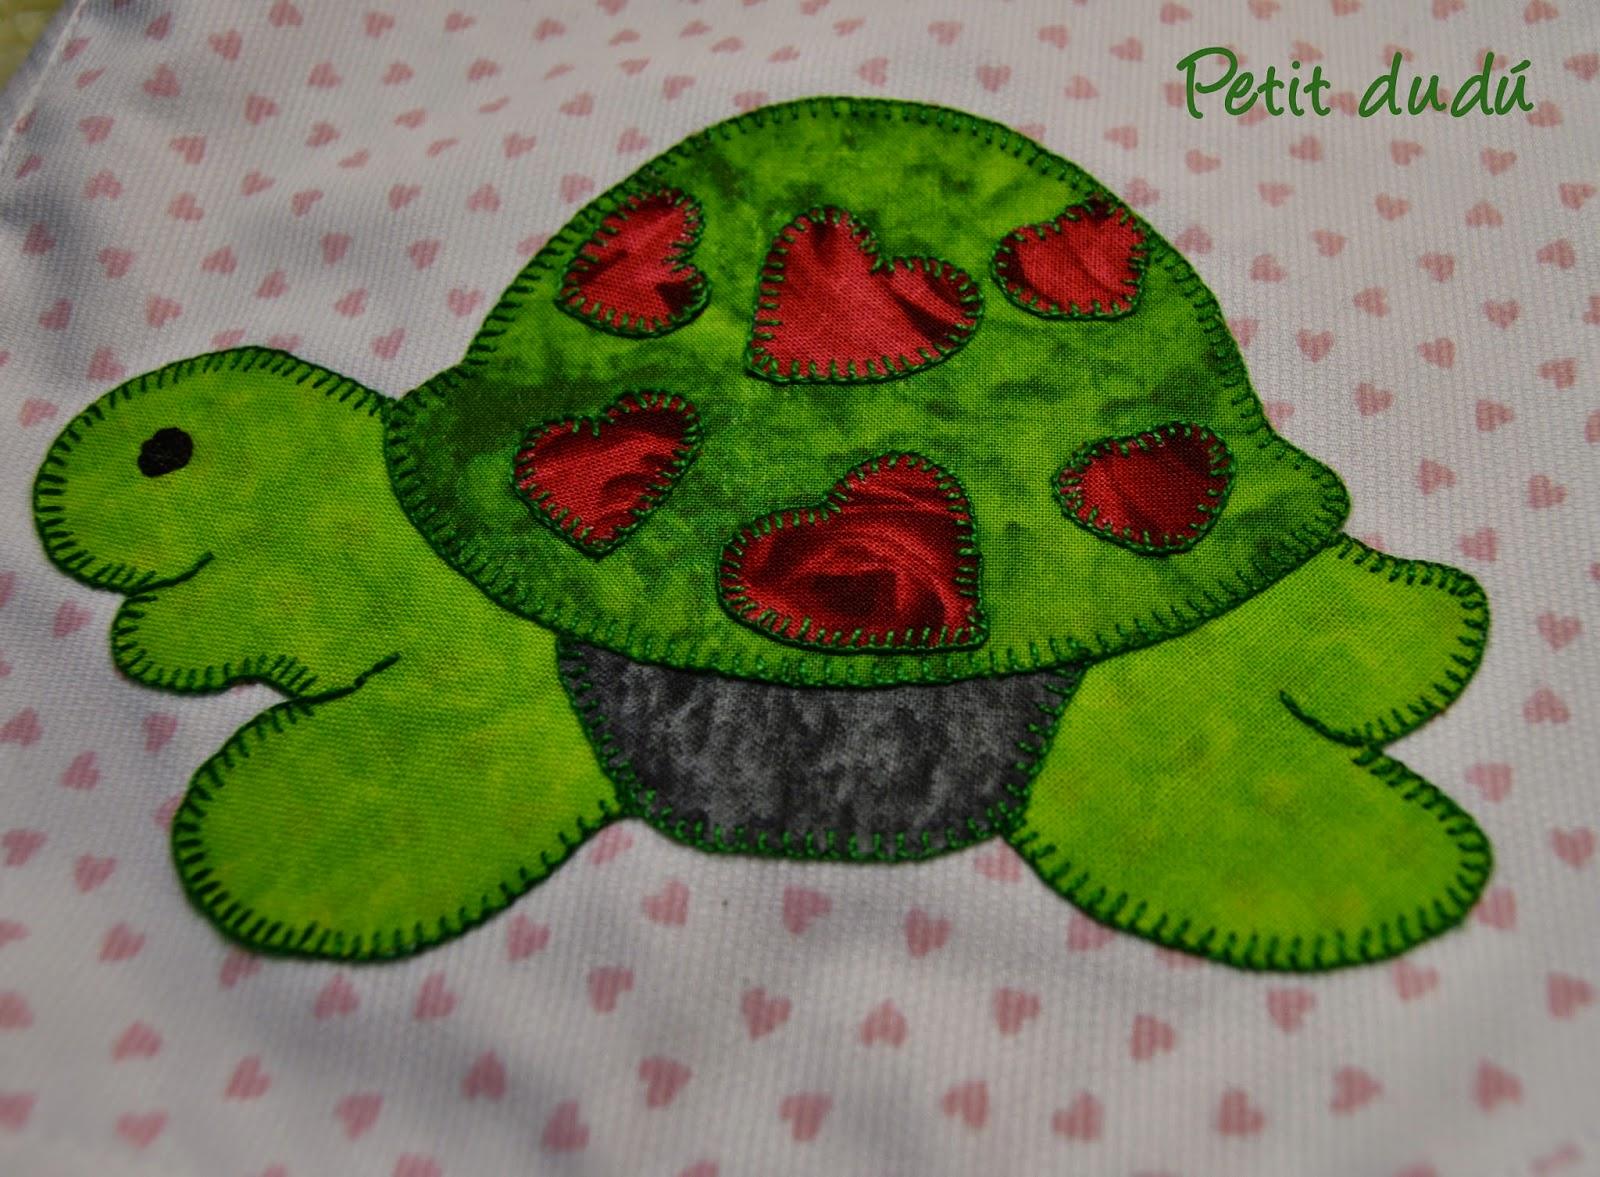 babero tortuga petitdudu